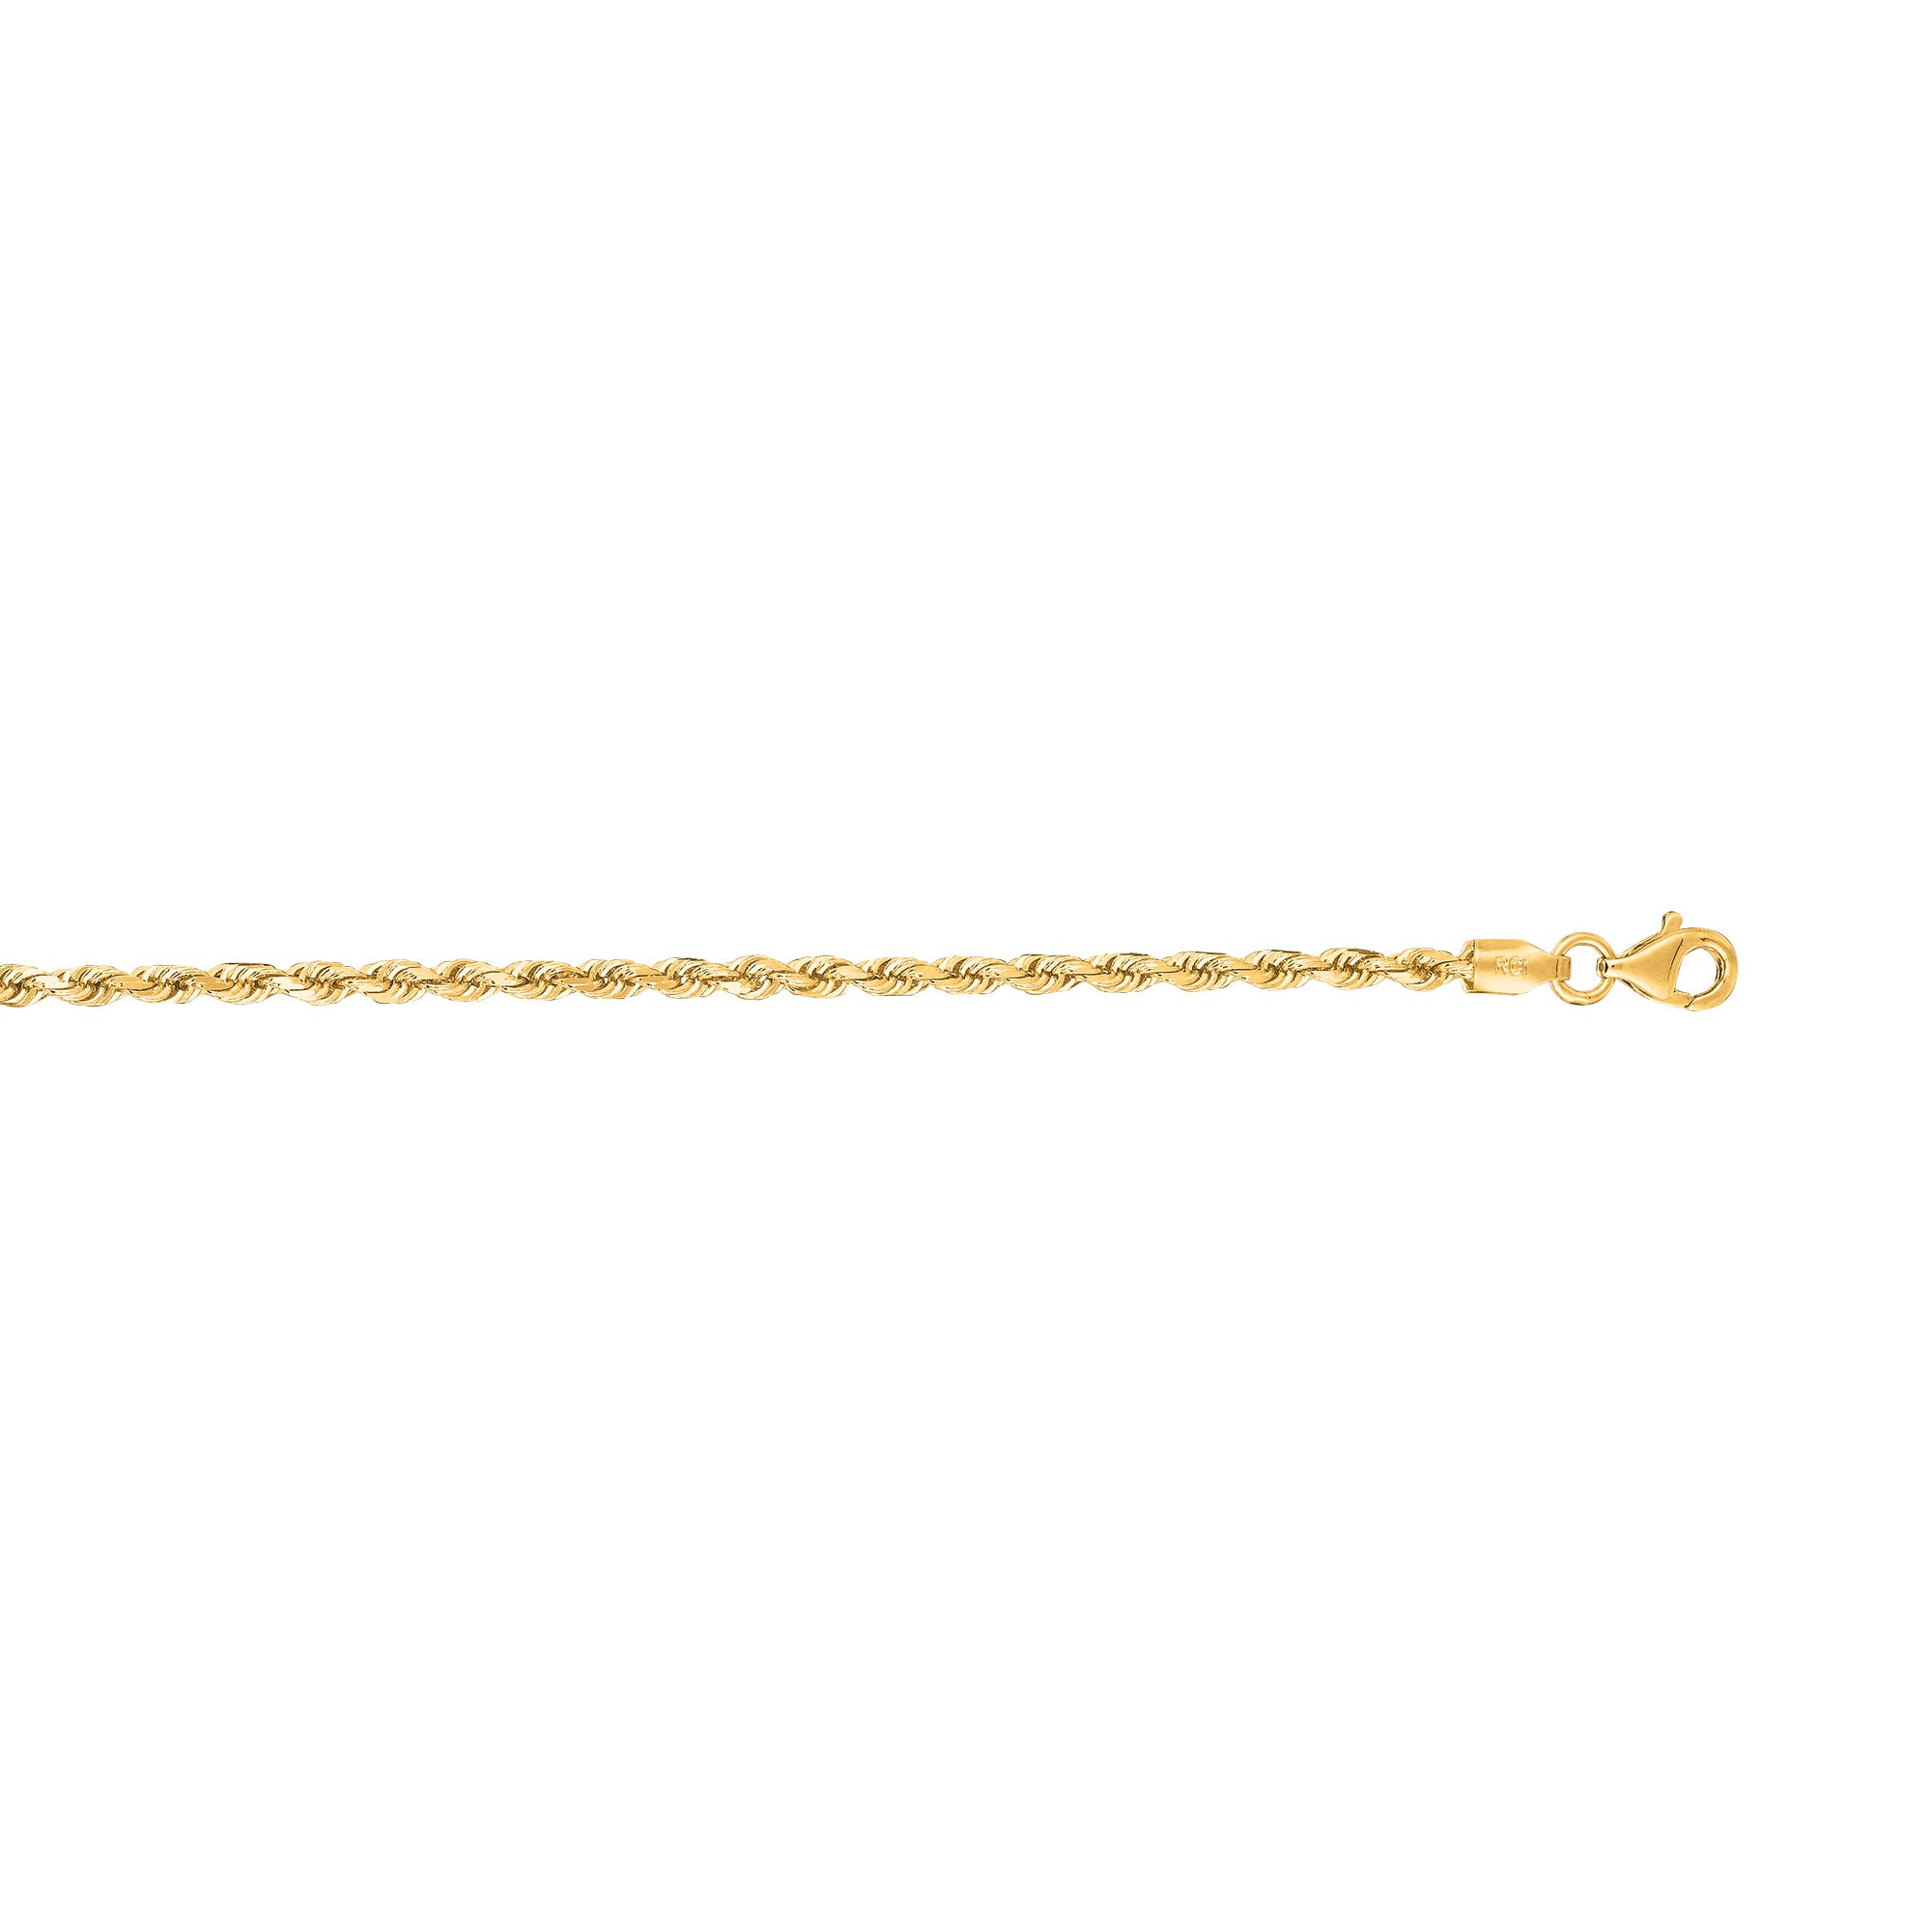 Diamond Cut Rope Chain 20